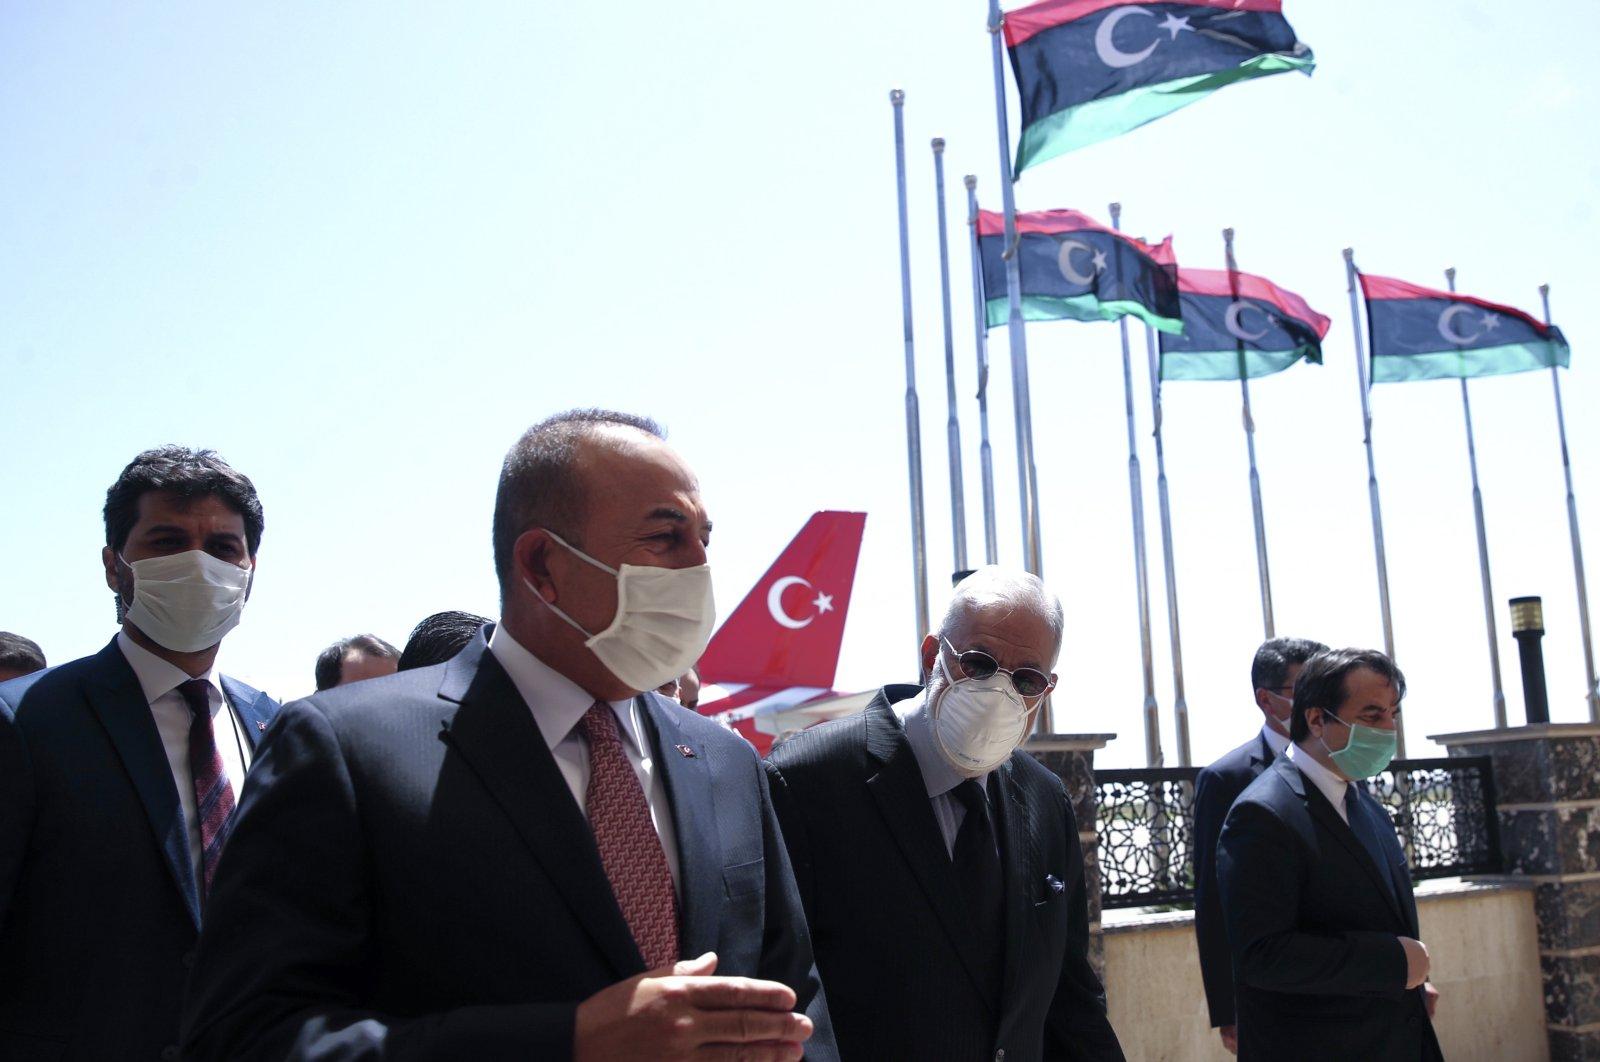 Foreign Minister Mevlüt Çavuşoğlu, left, and Muhammed Tahir Siyala, Foreign Minister of Libya's internationally-recognized government, speak at the airport, in Tripoli, Libya, June 17, 2020. (AP)